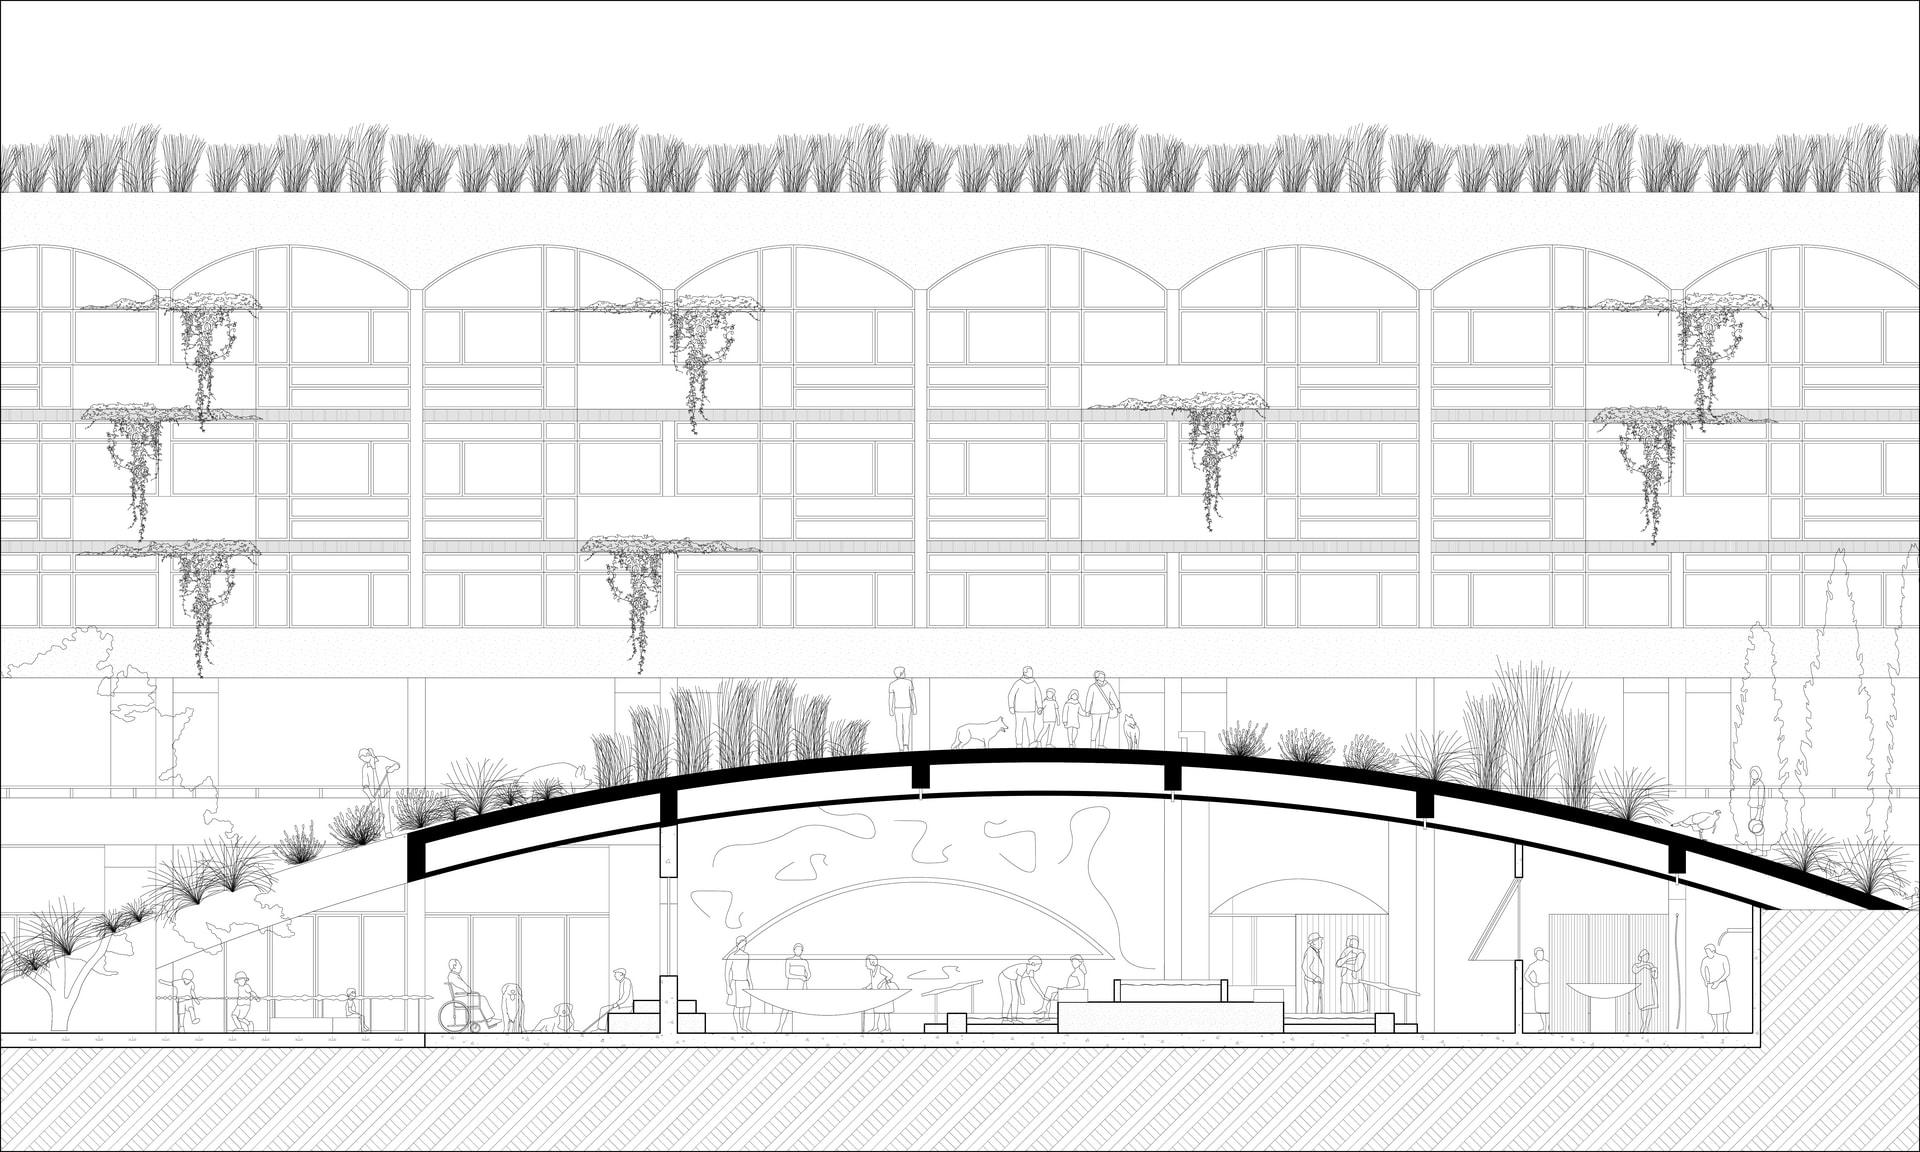 Baths: Hill Section - Digital drawing